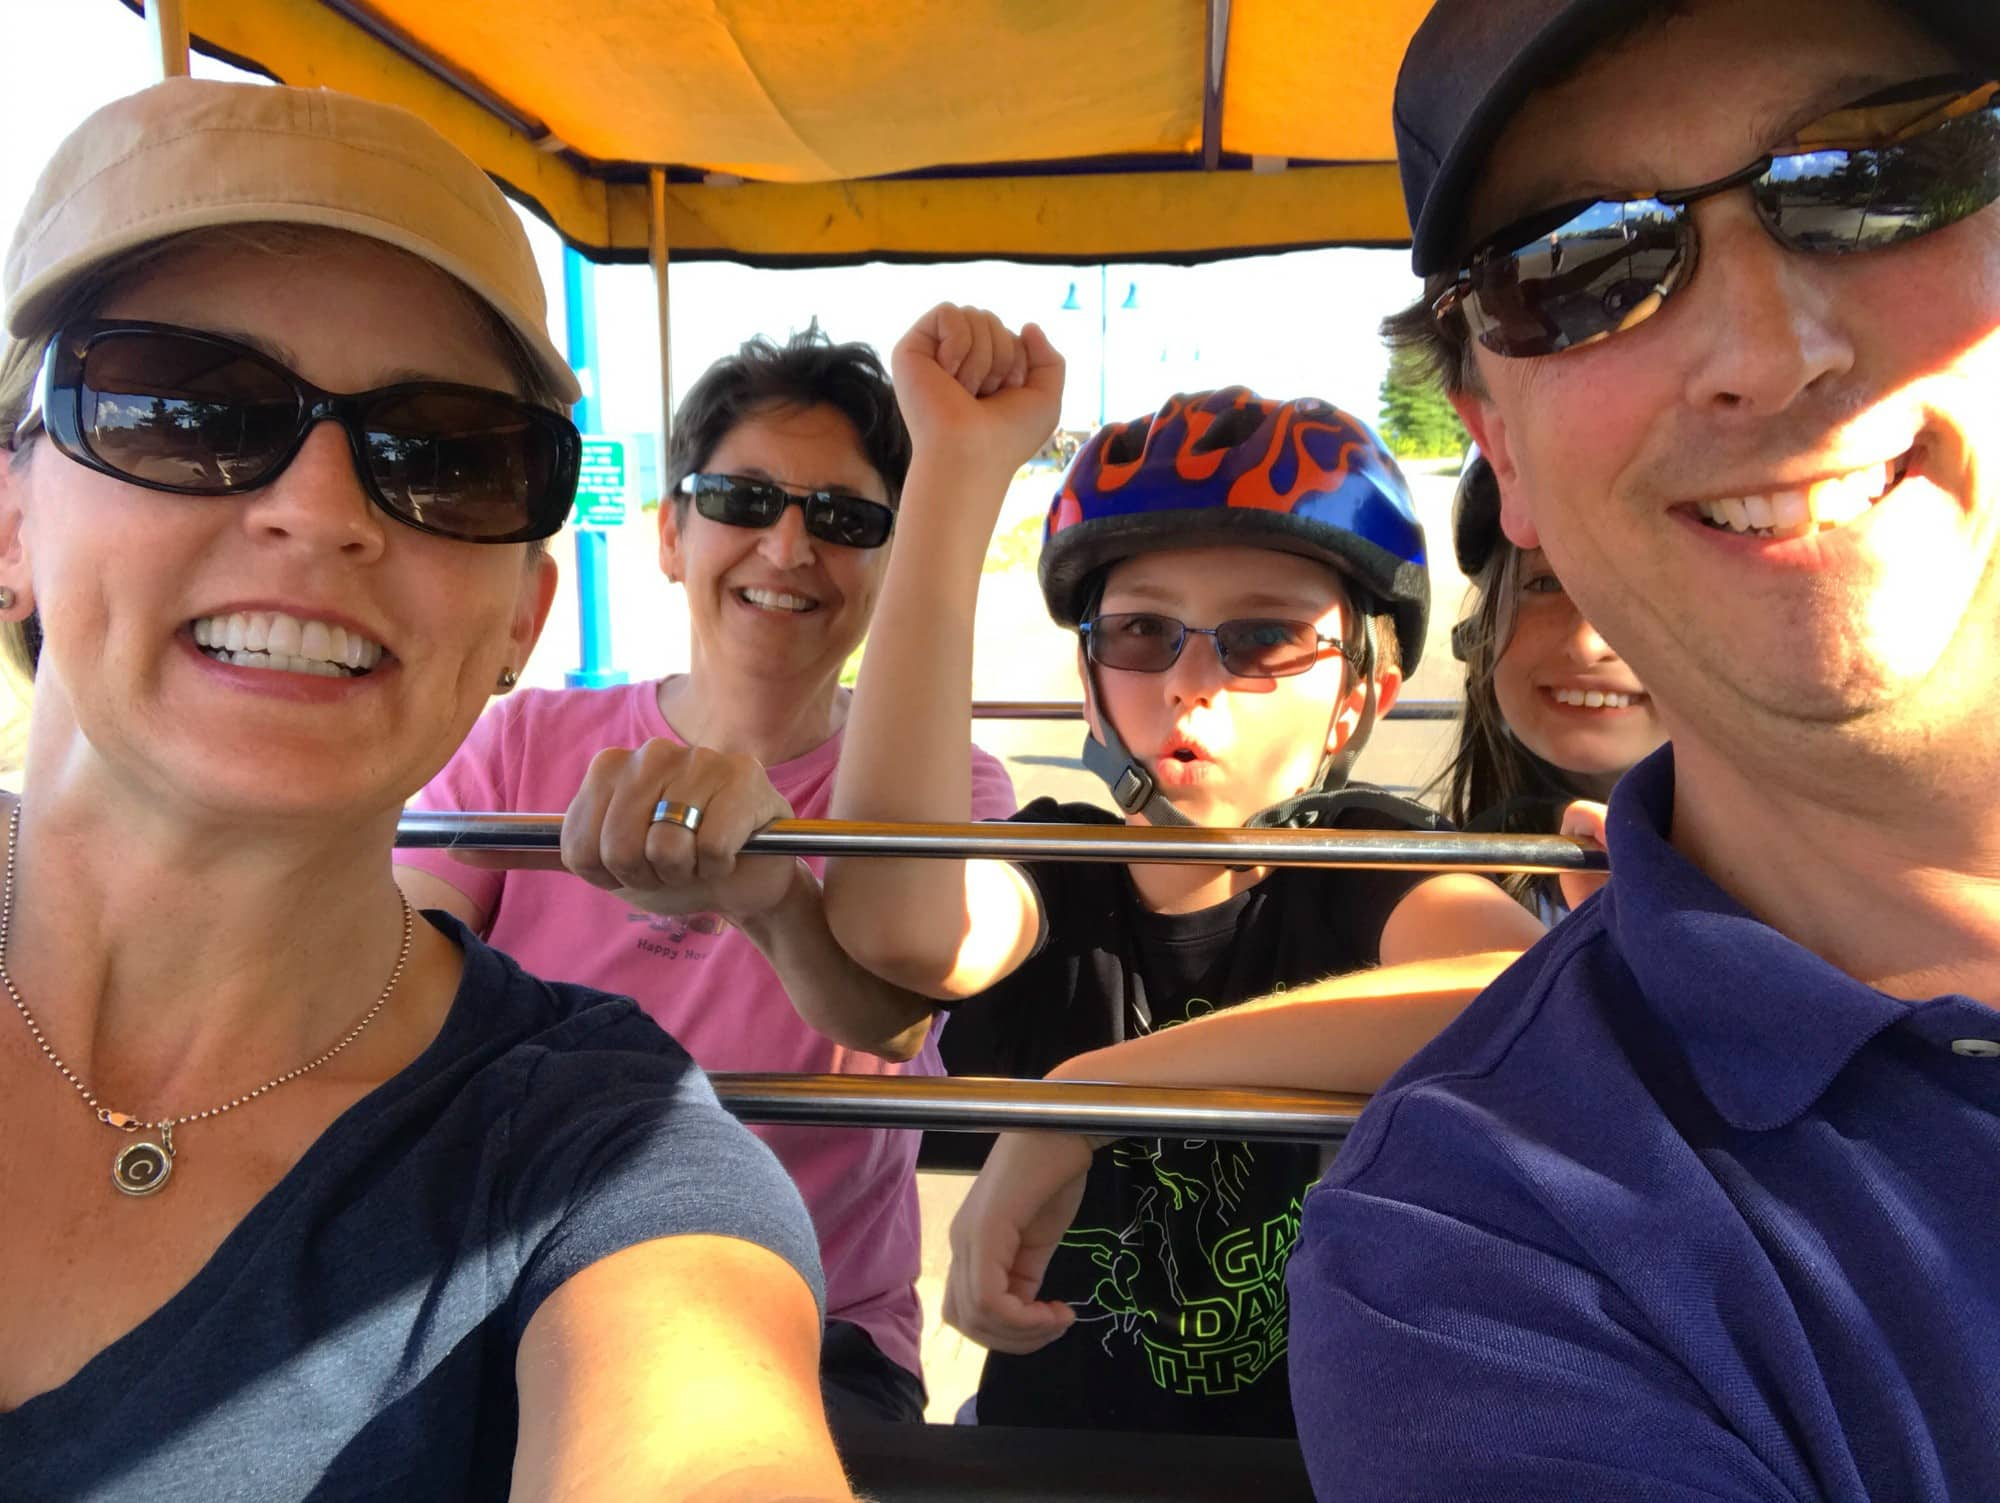 Wheel Fun surrey rental in Duluth with kids